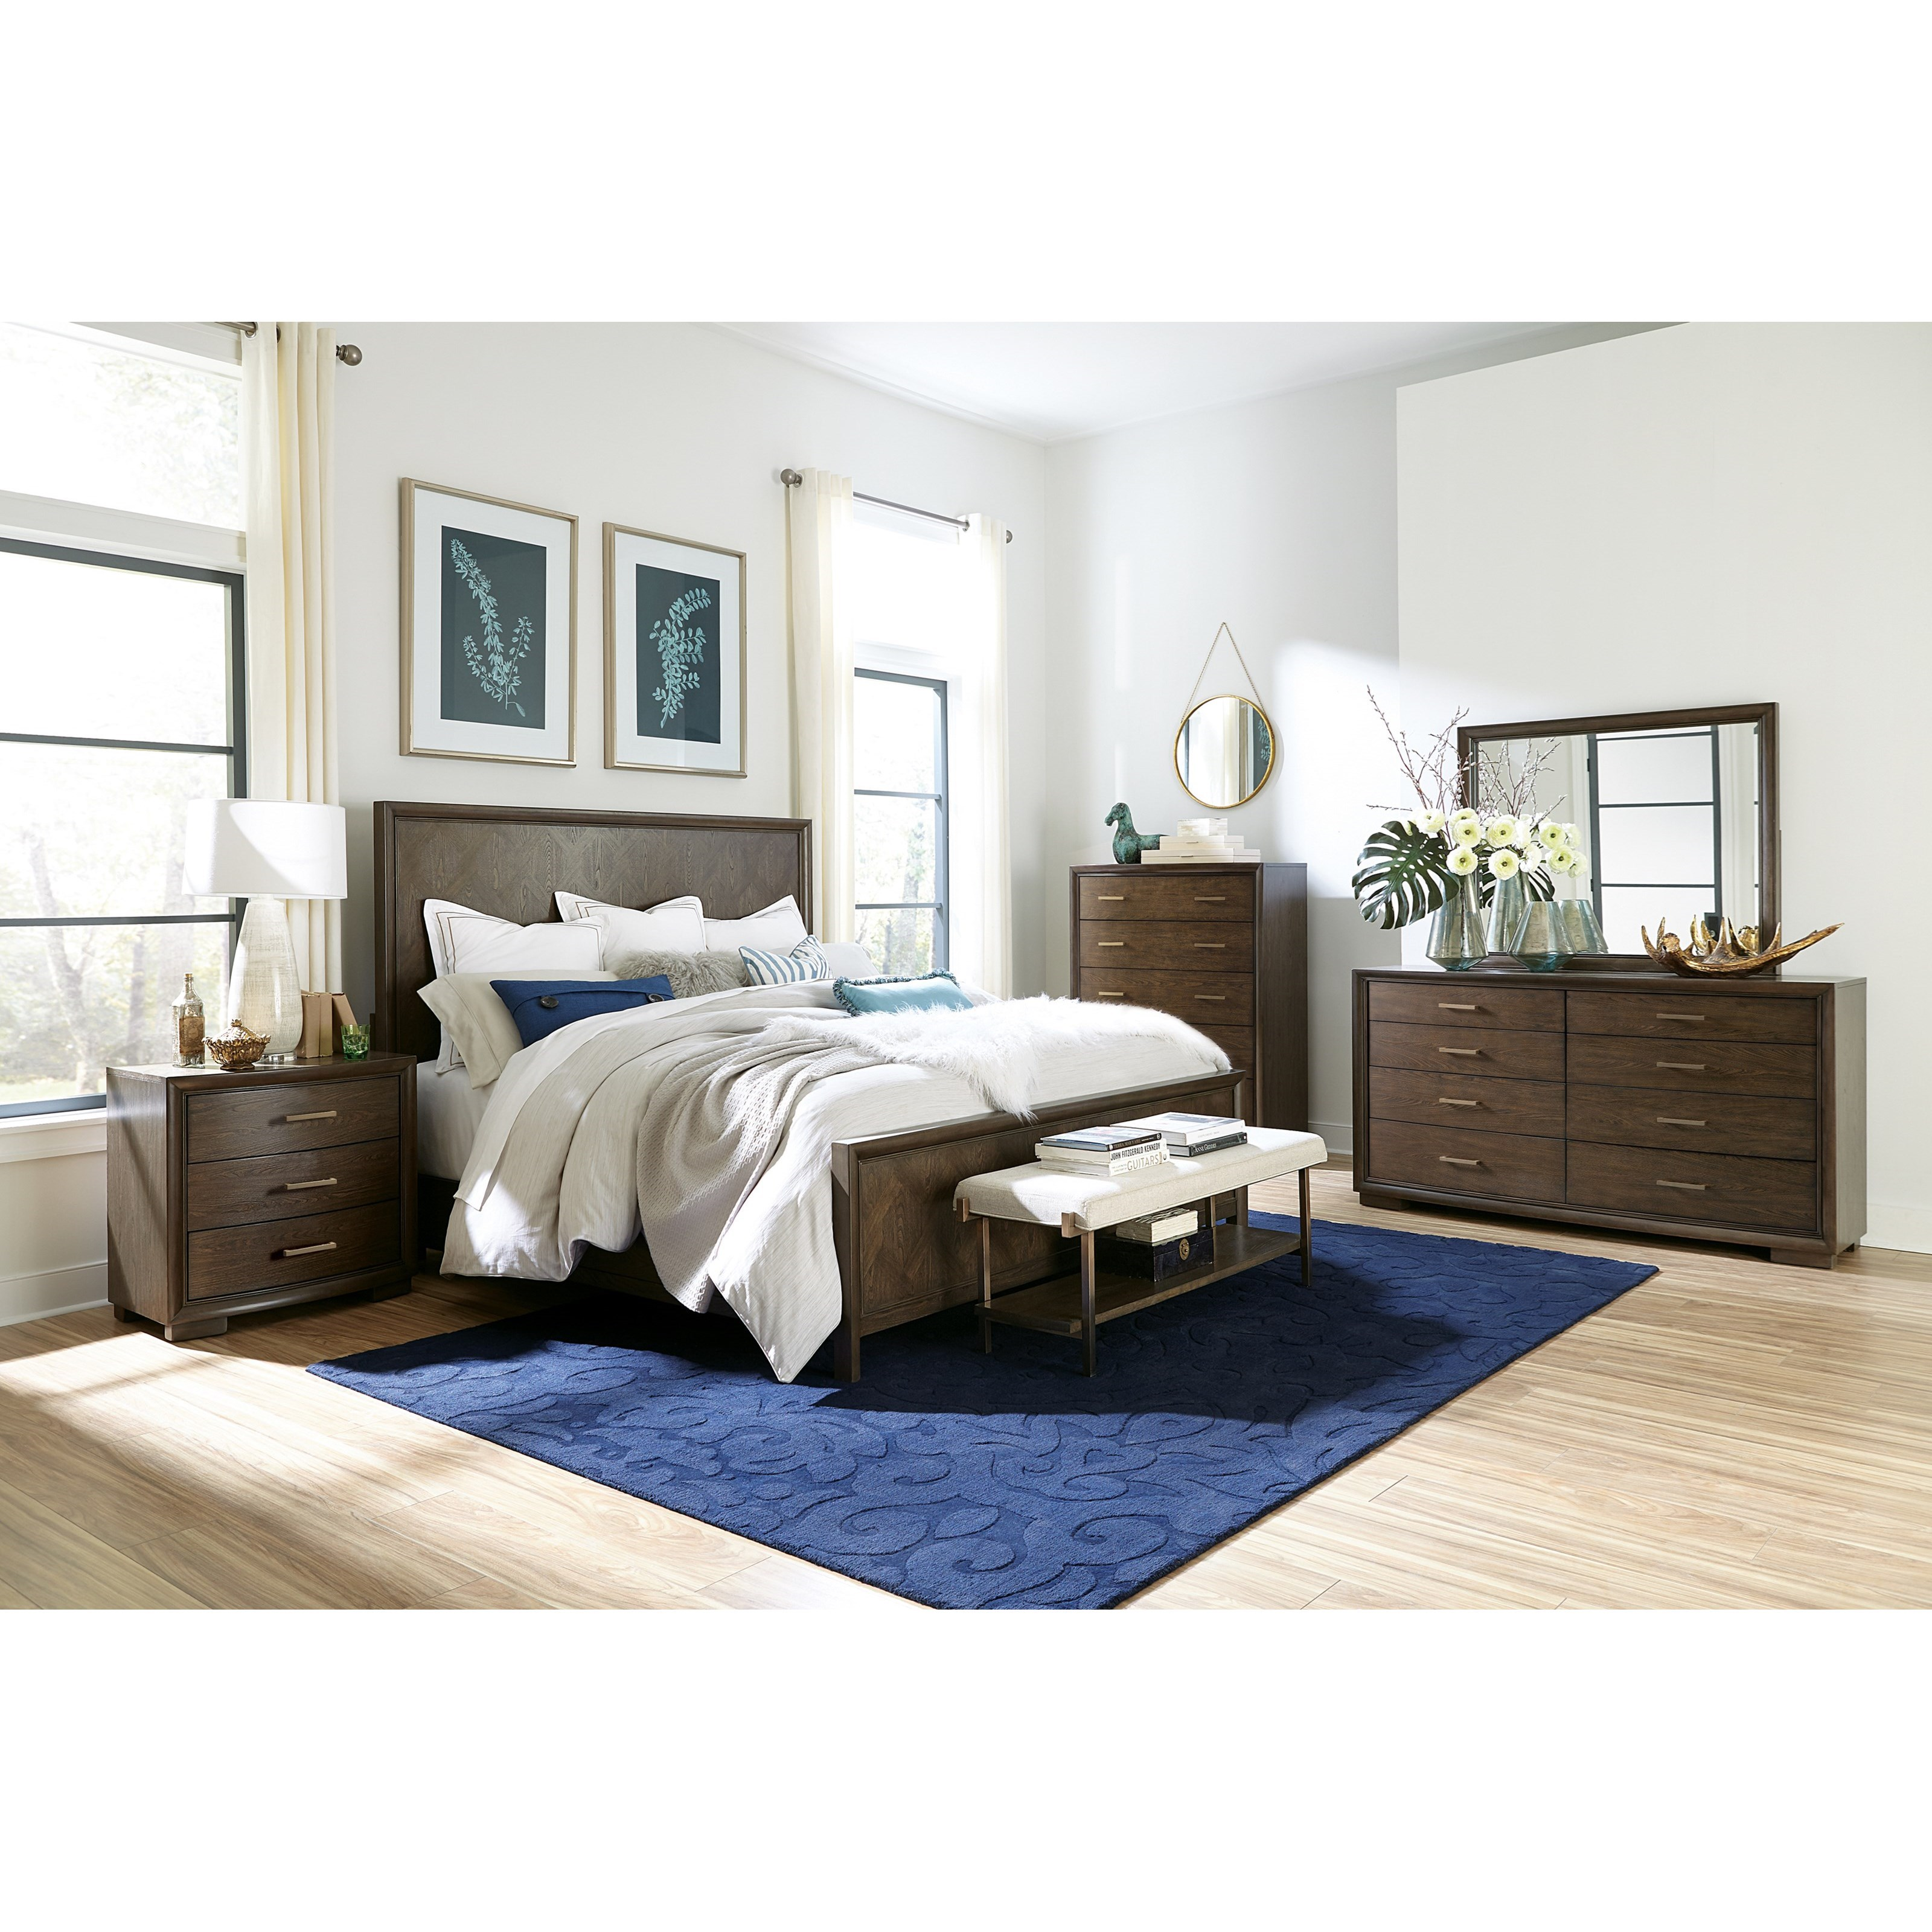 Riverside Furniture Monterey King Bedroom Group Lindy S Furniture Company Bedroom Groups